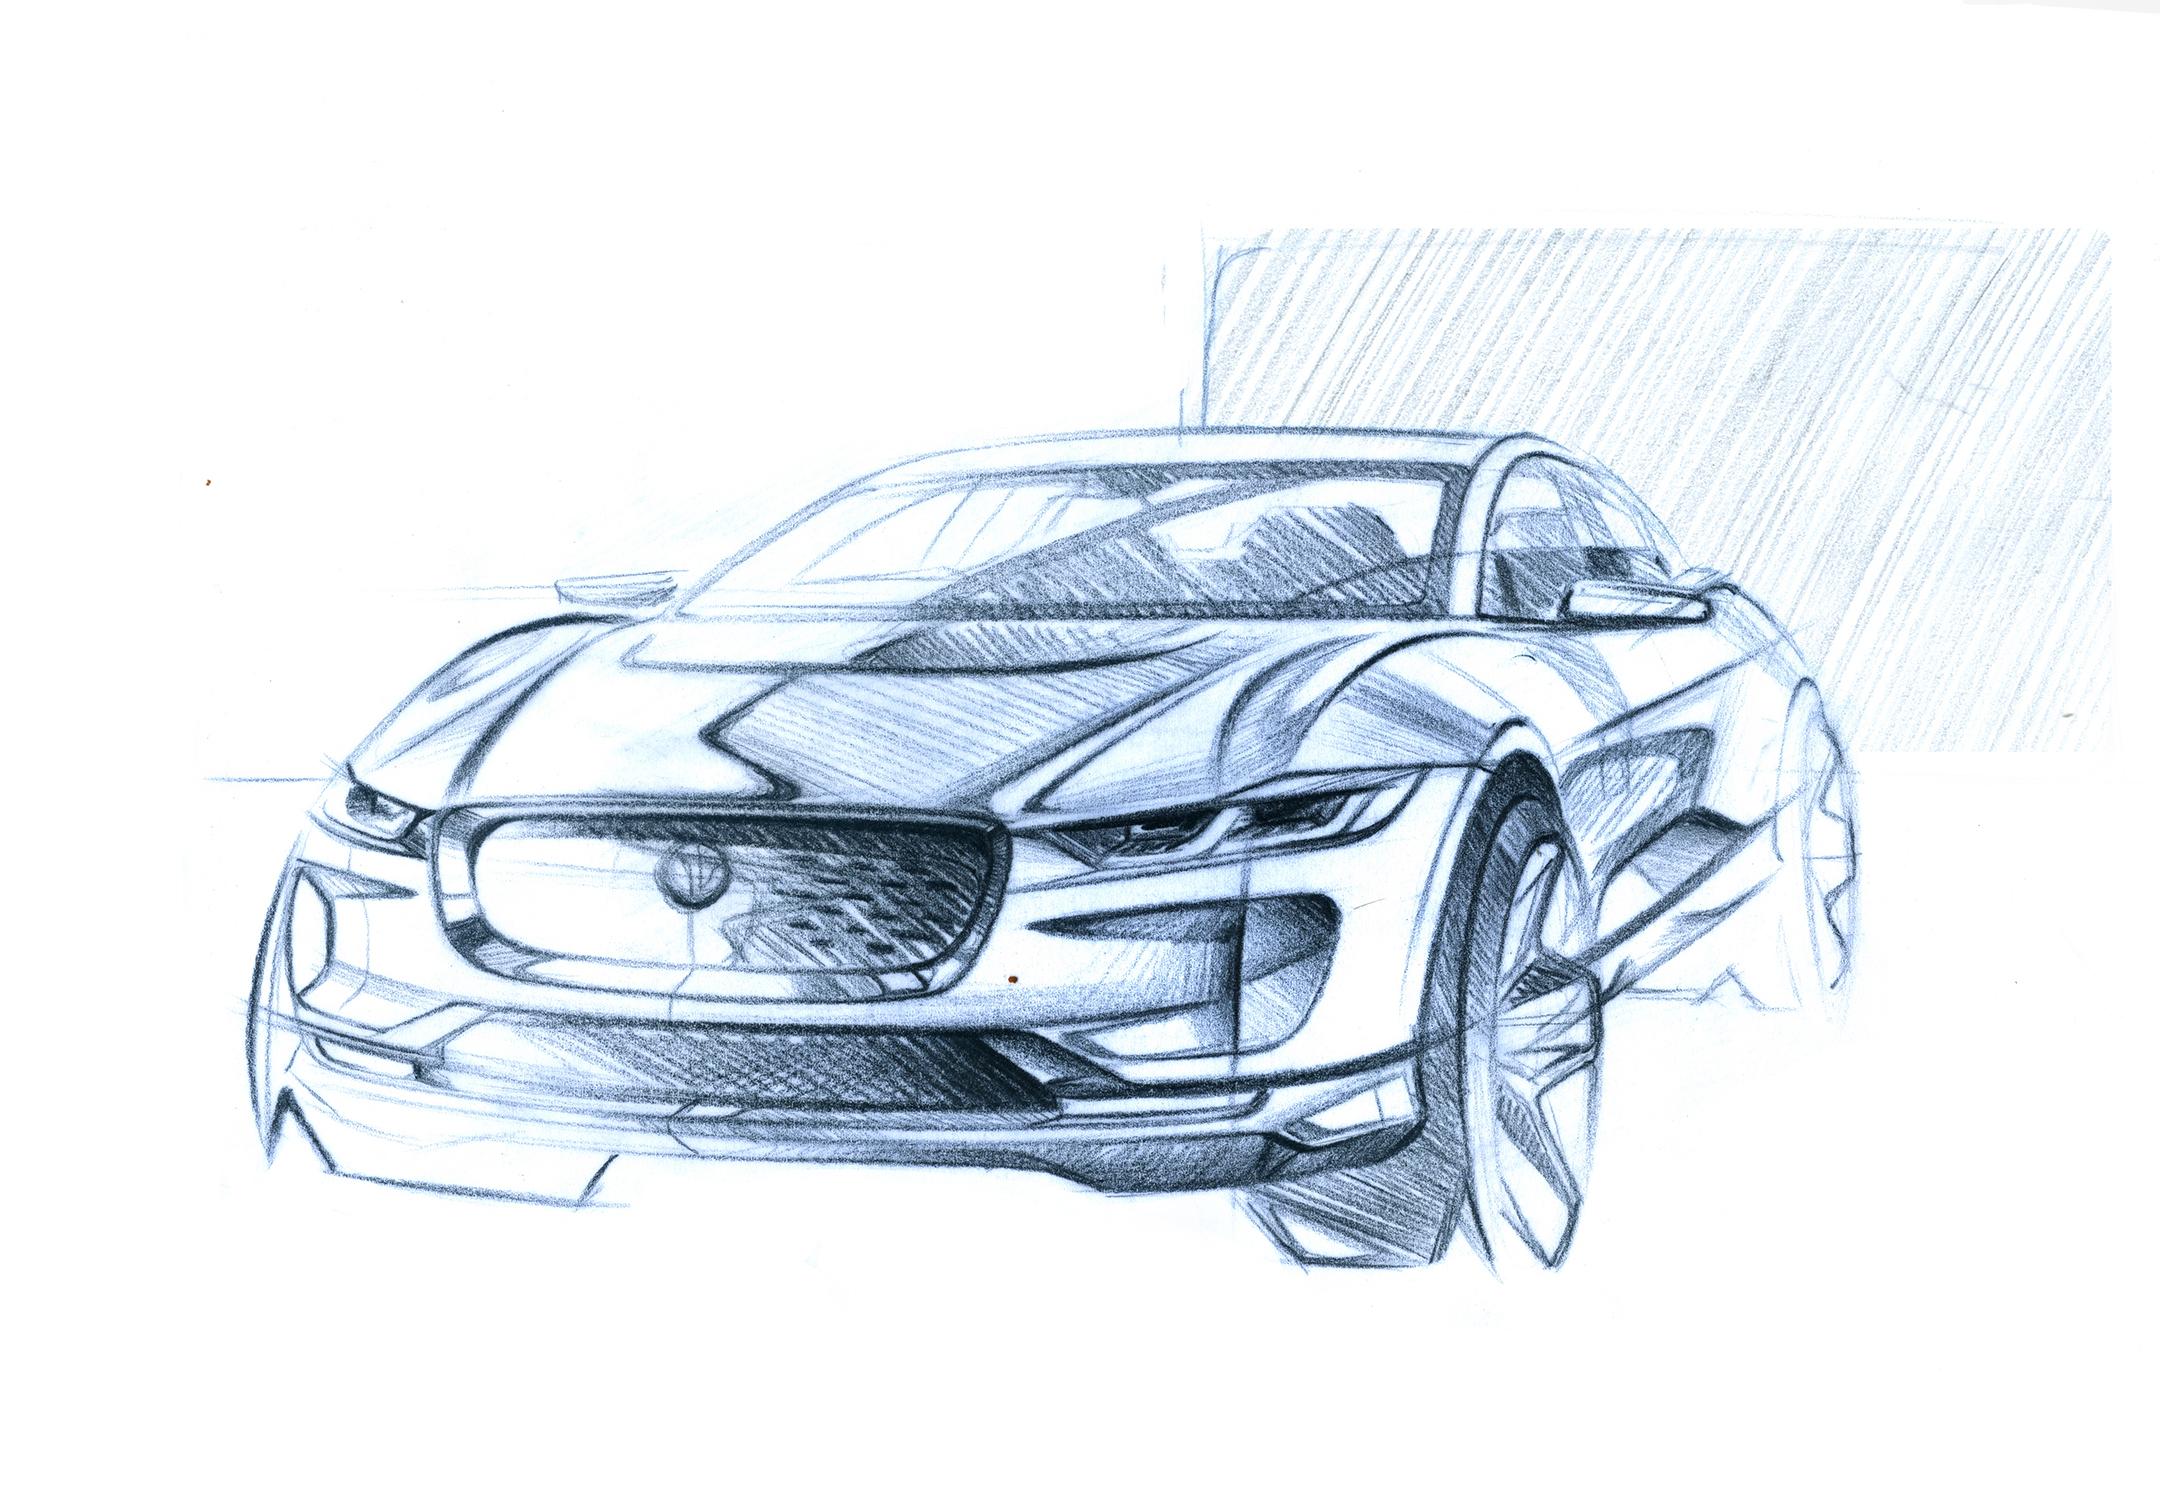 Jaguar I-PACE - 2018 - sketch design - front / avant